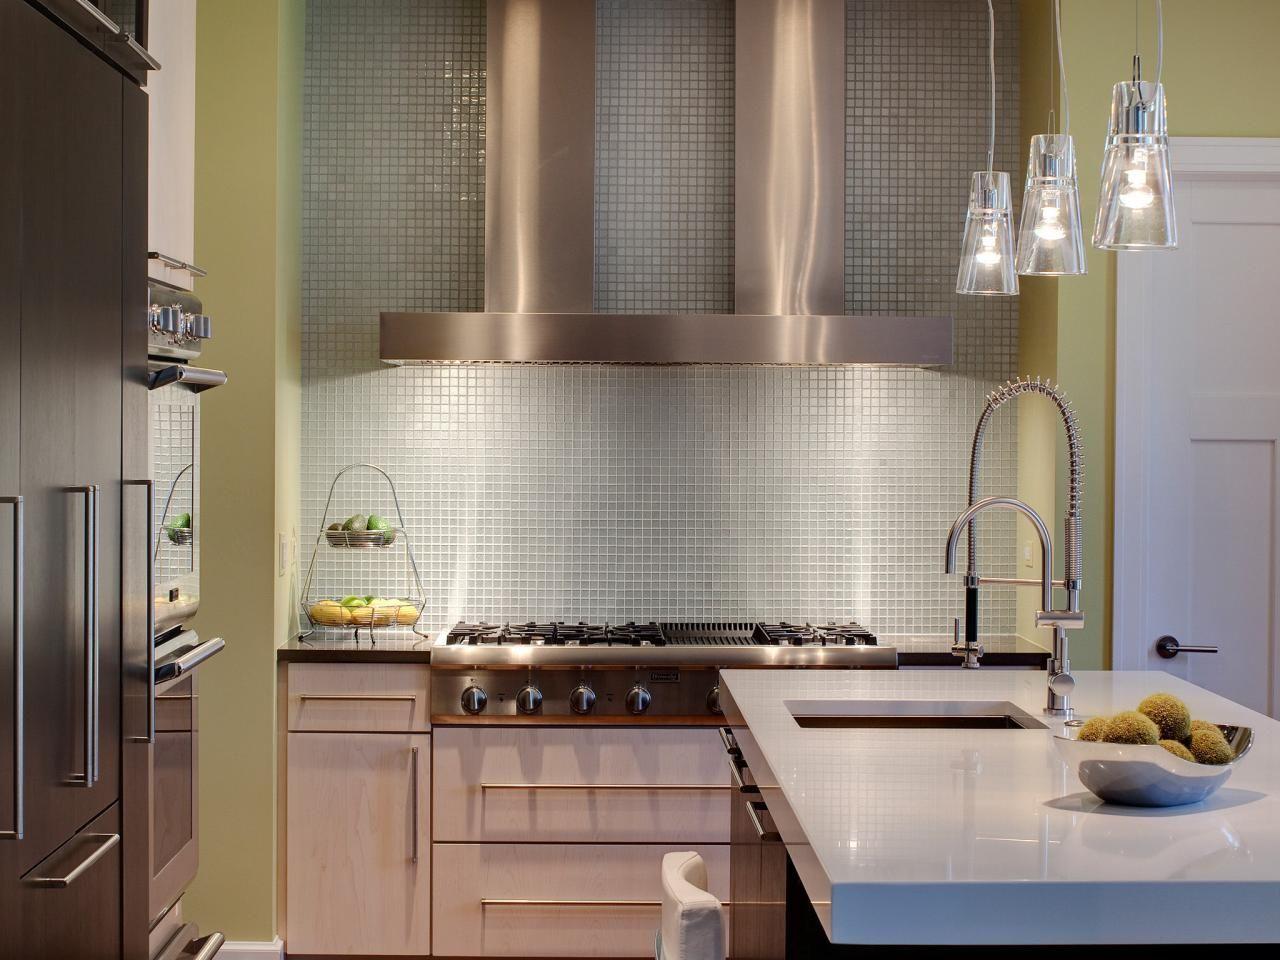 Compact Carpet Modern Kitchen Backsplash Ideas Decor Lamp Shades Red